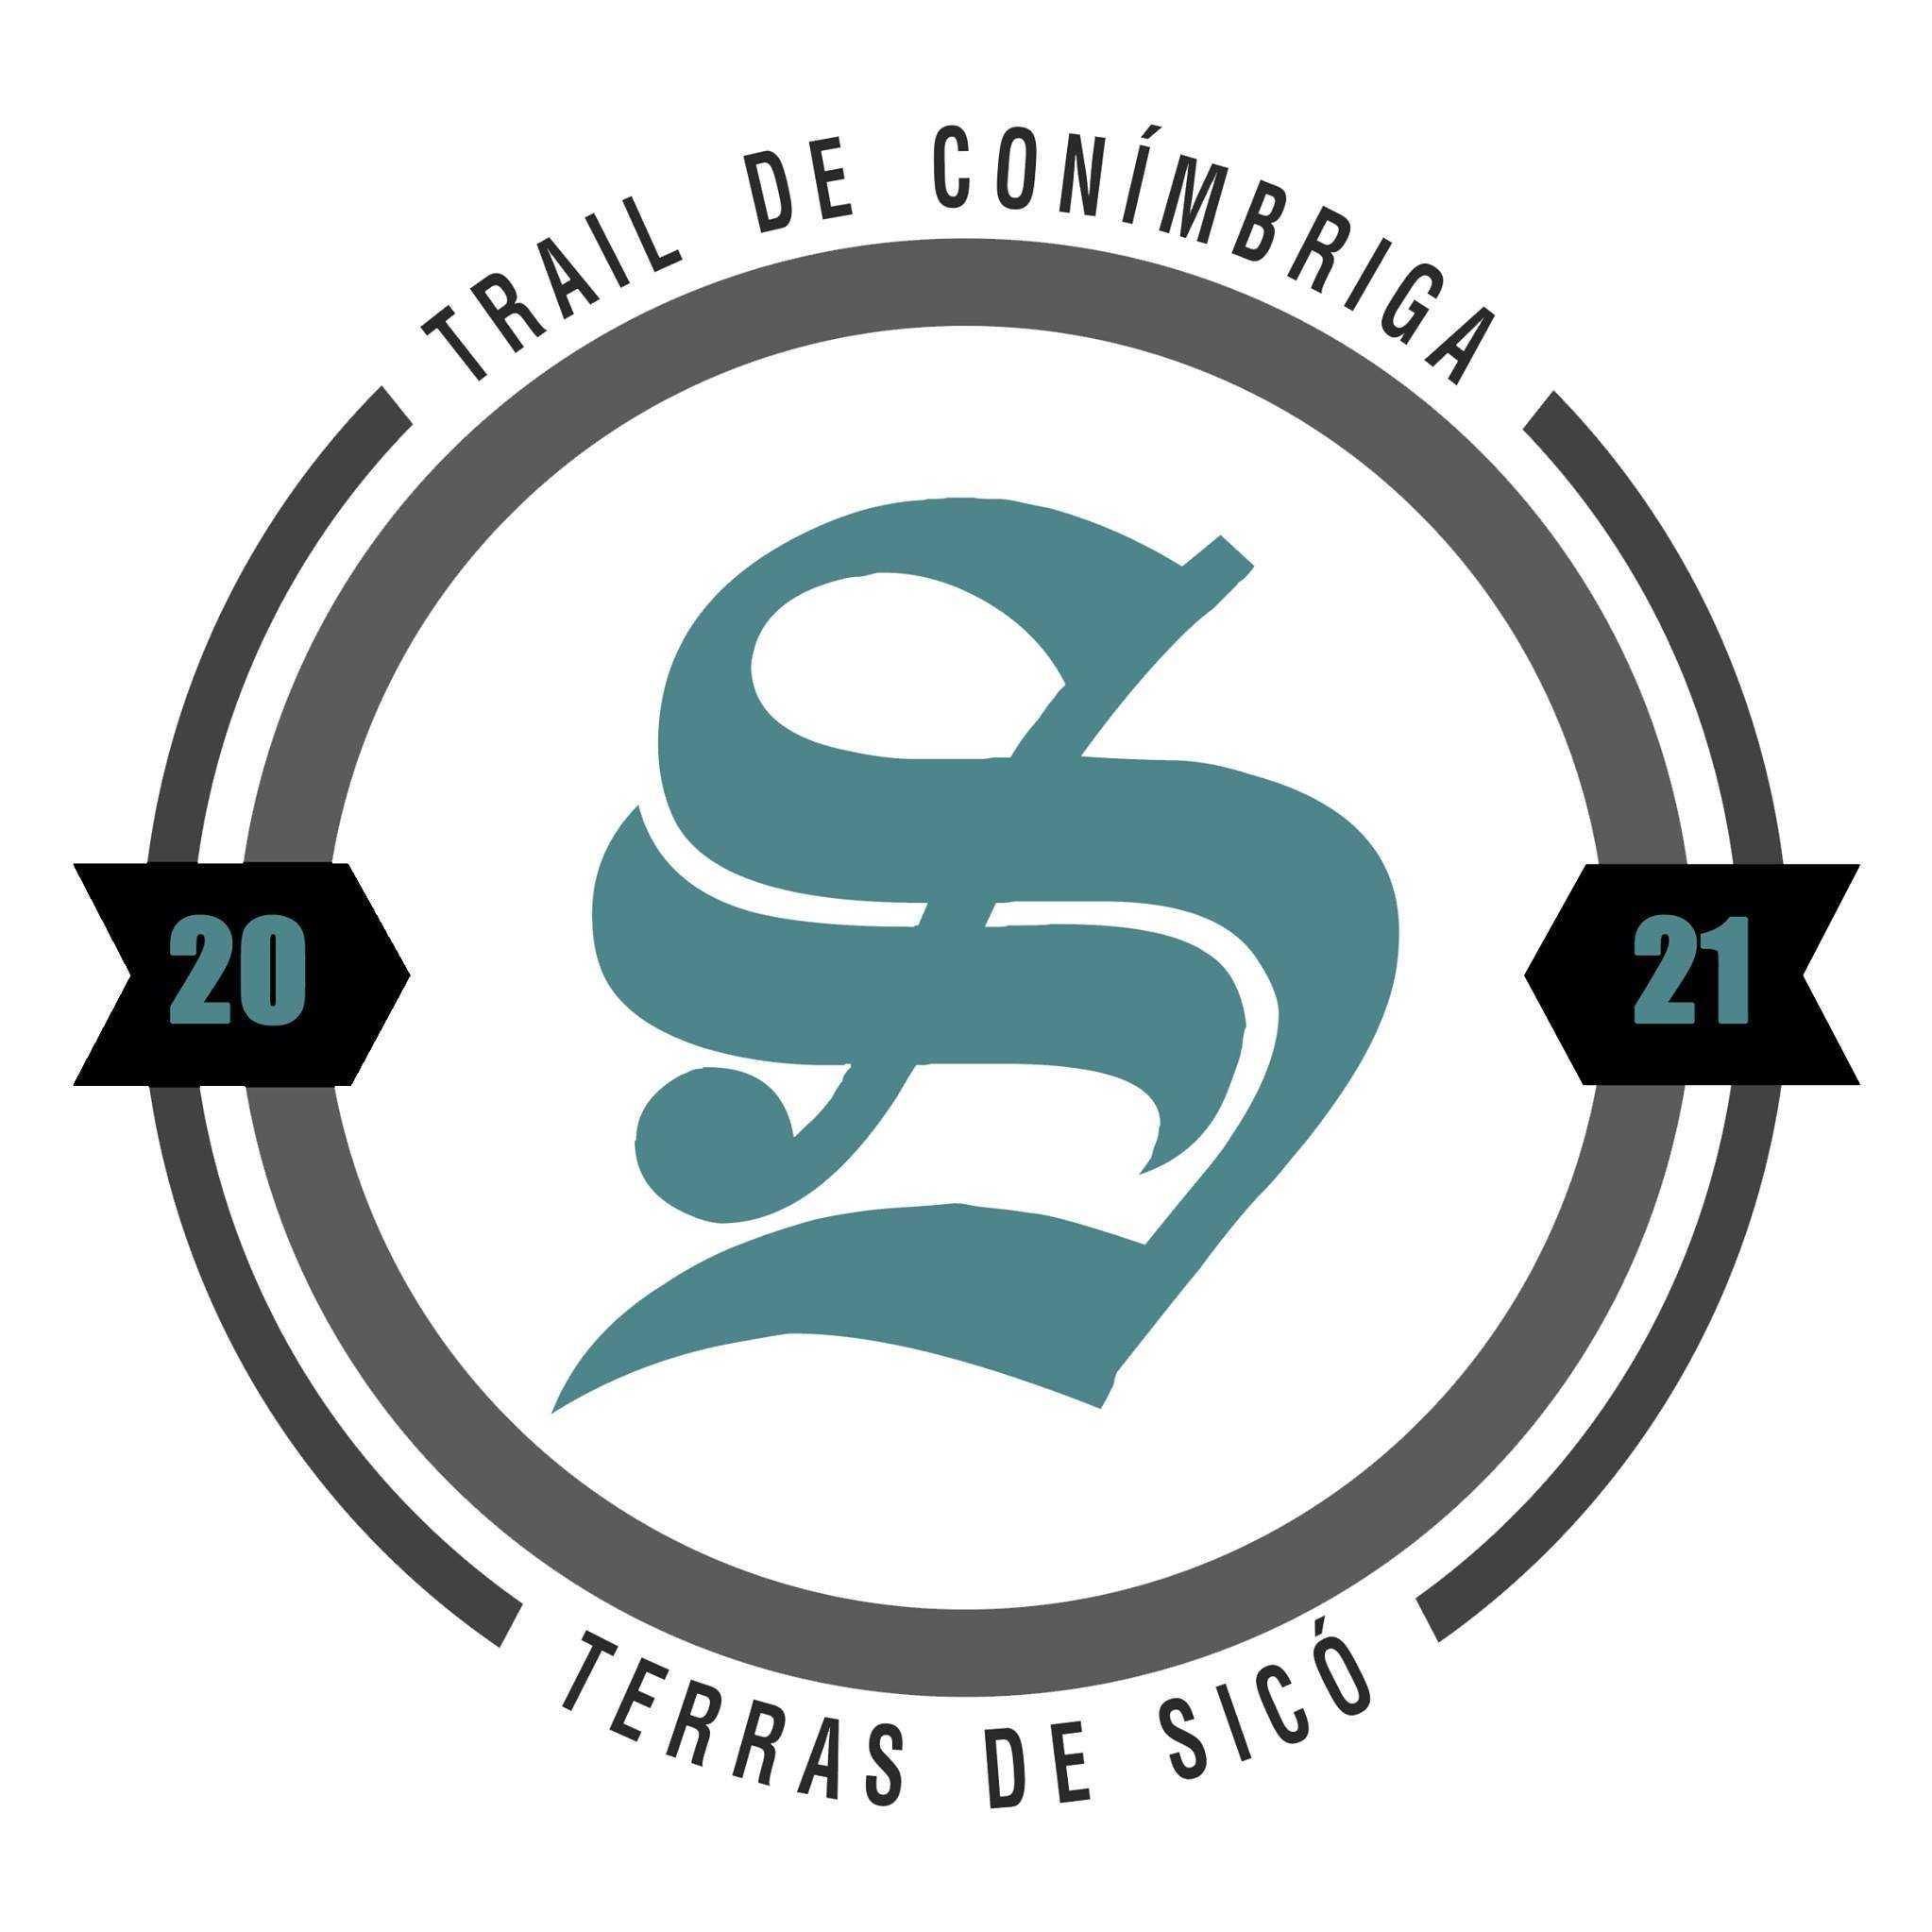 Trail de Conímbriga Terras de Sicó 2022